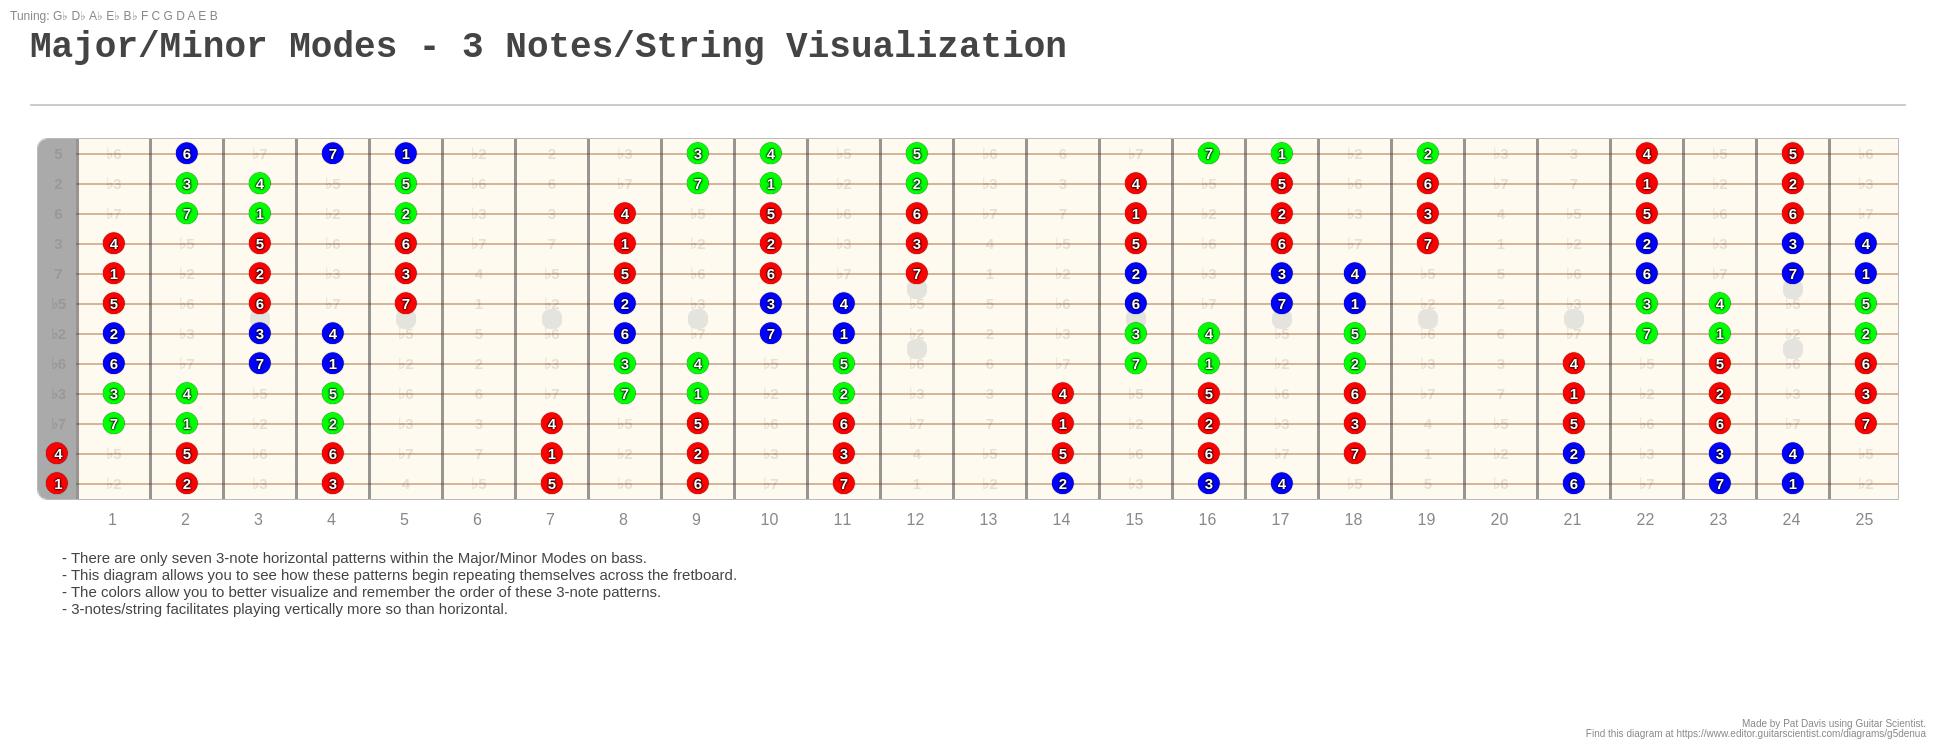 Major  Minor Modes - 3 Notes  String Visualization